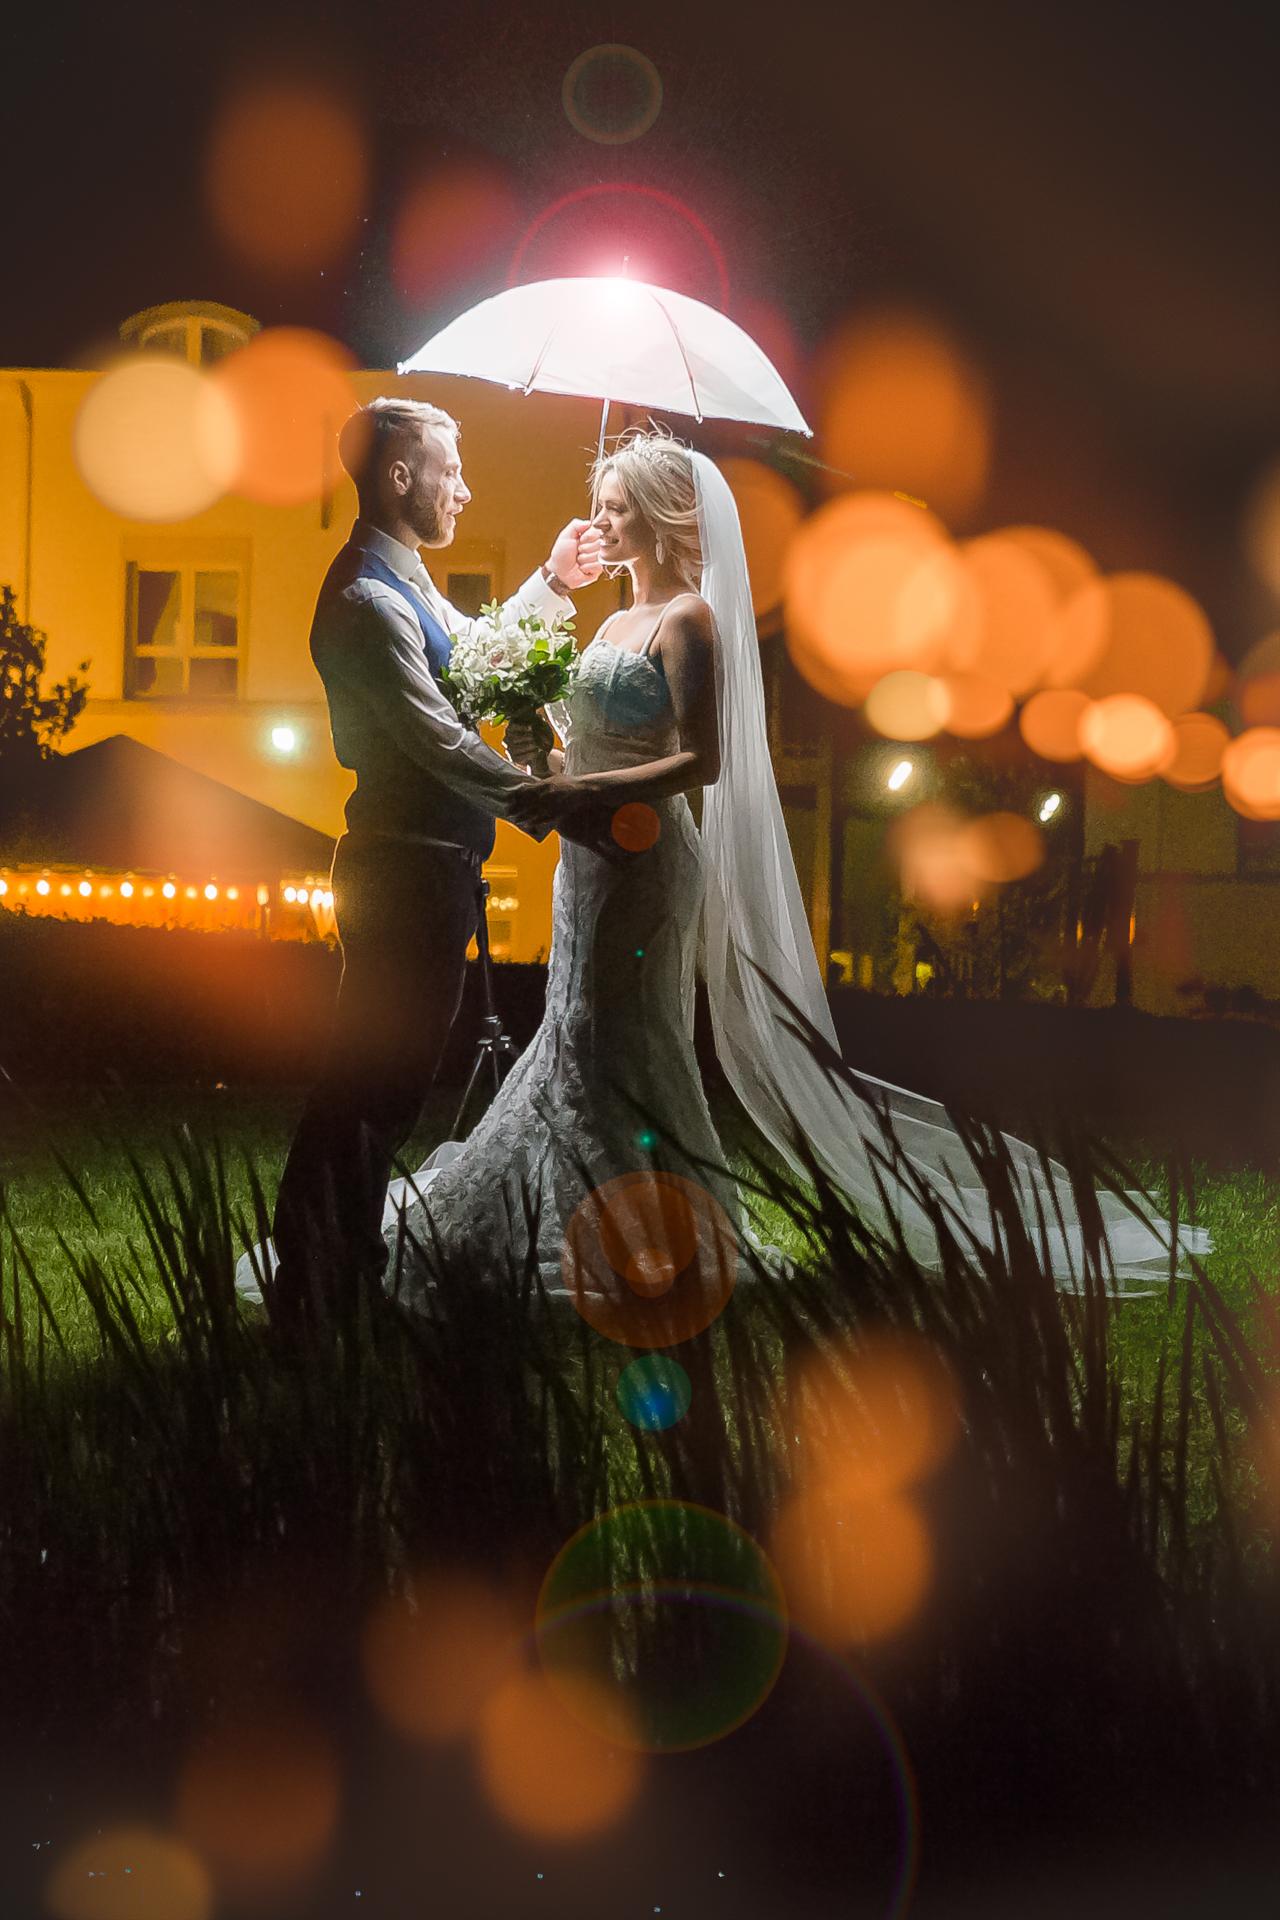 Wedding and portrait Photography Portlaoise Co. Laois | Joe Conroy